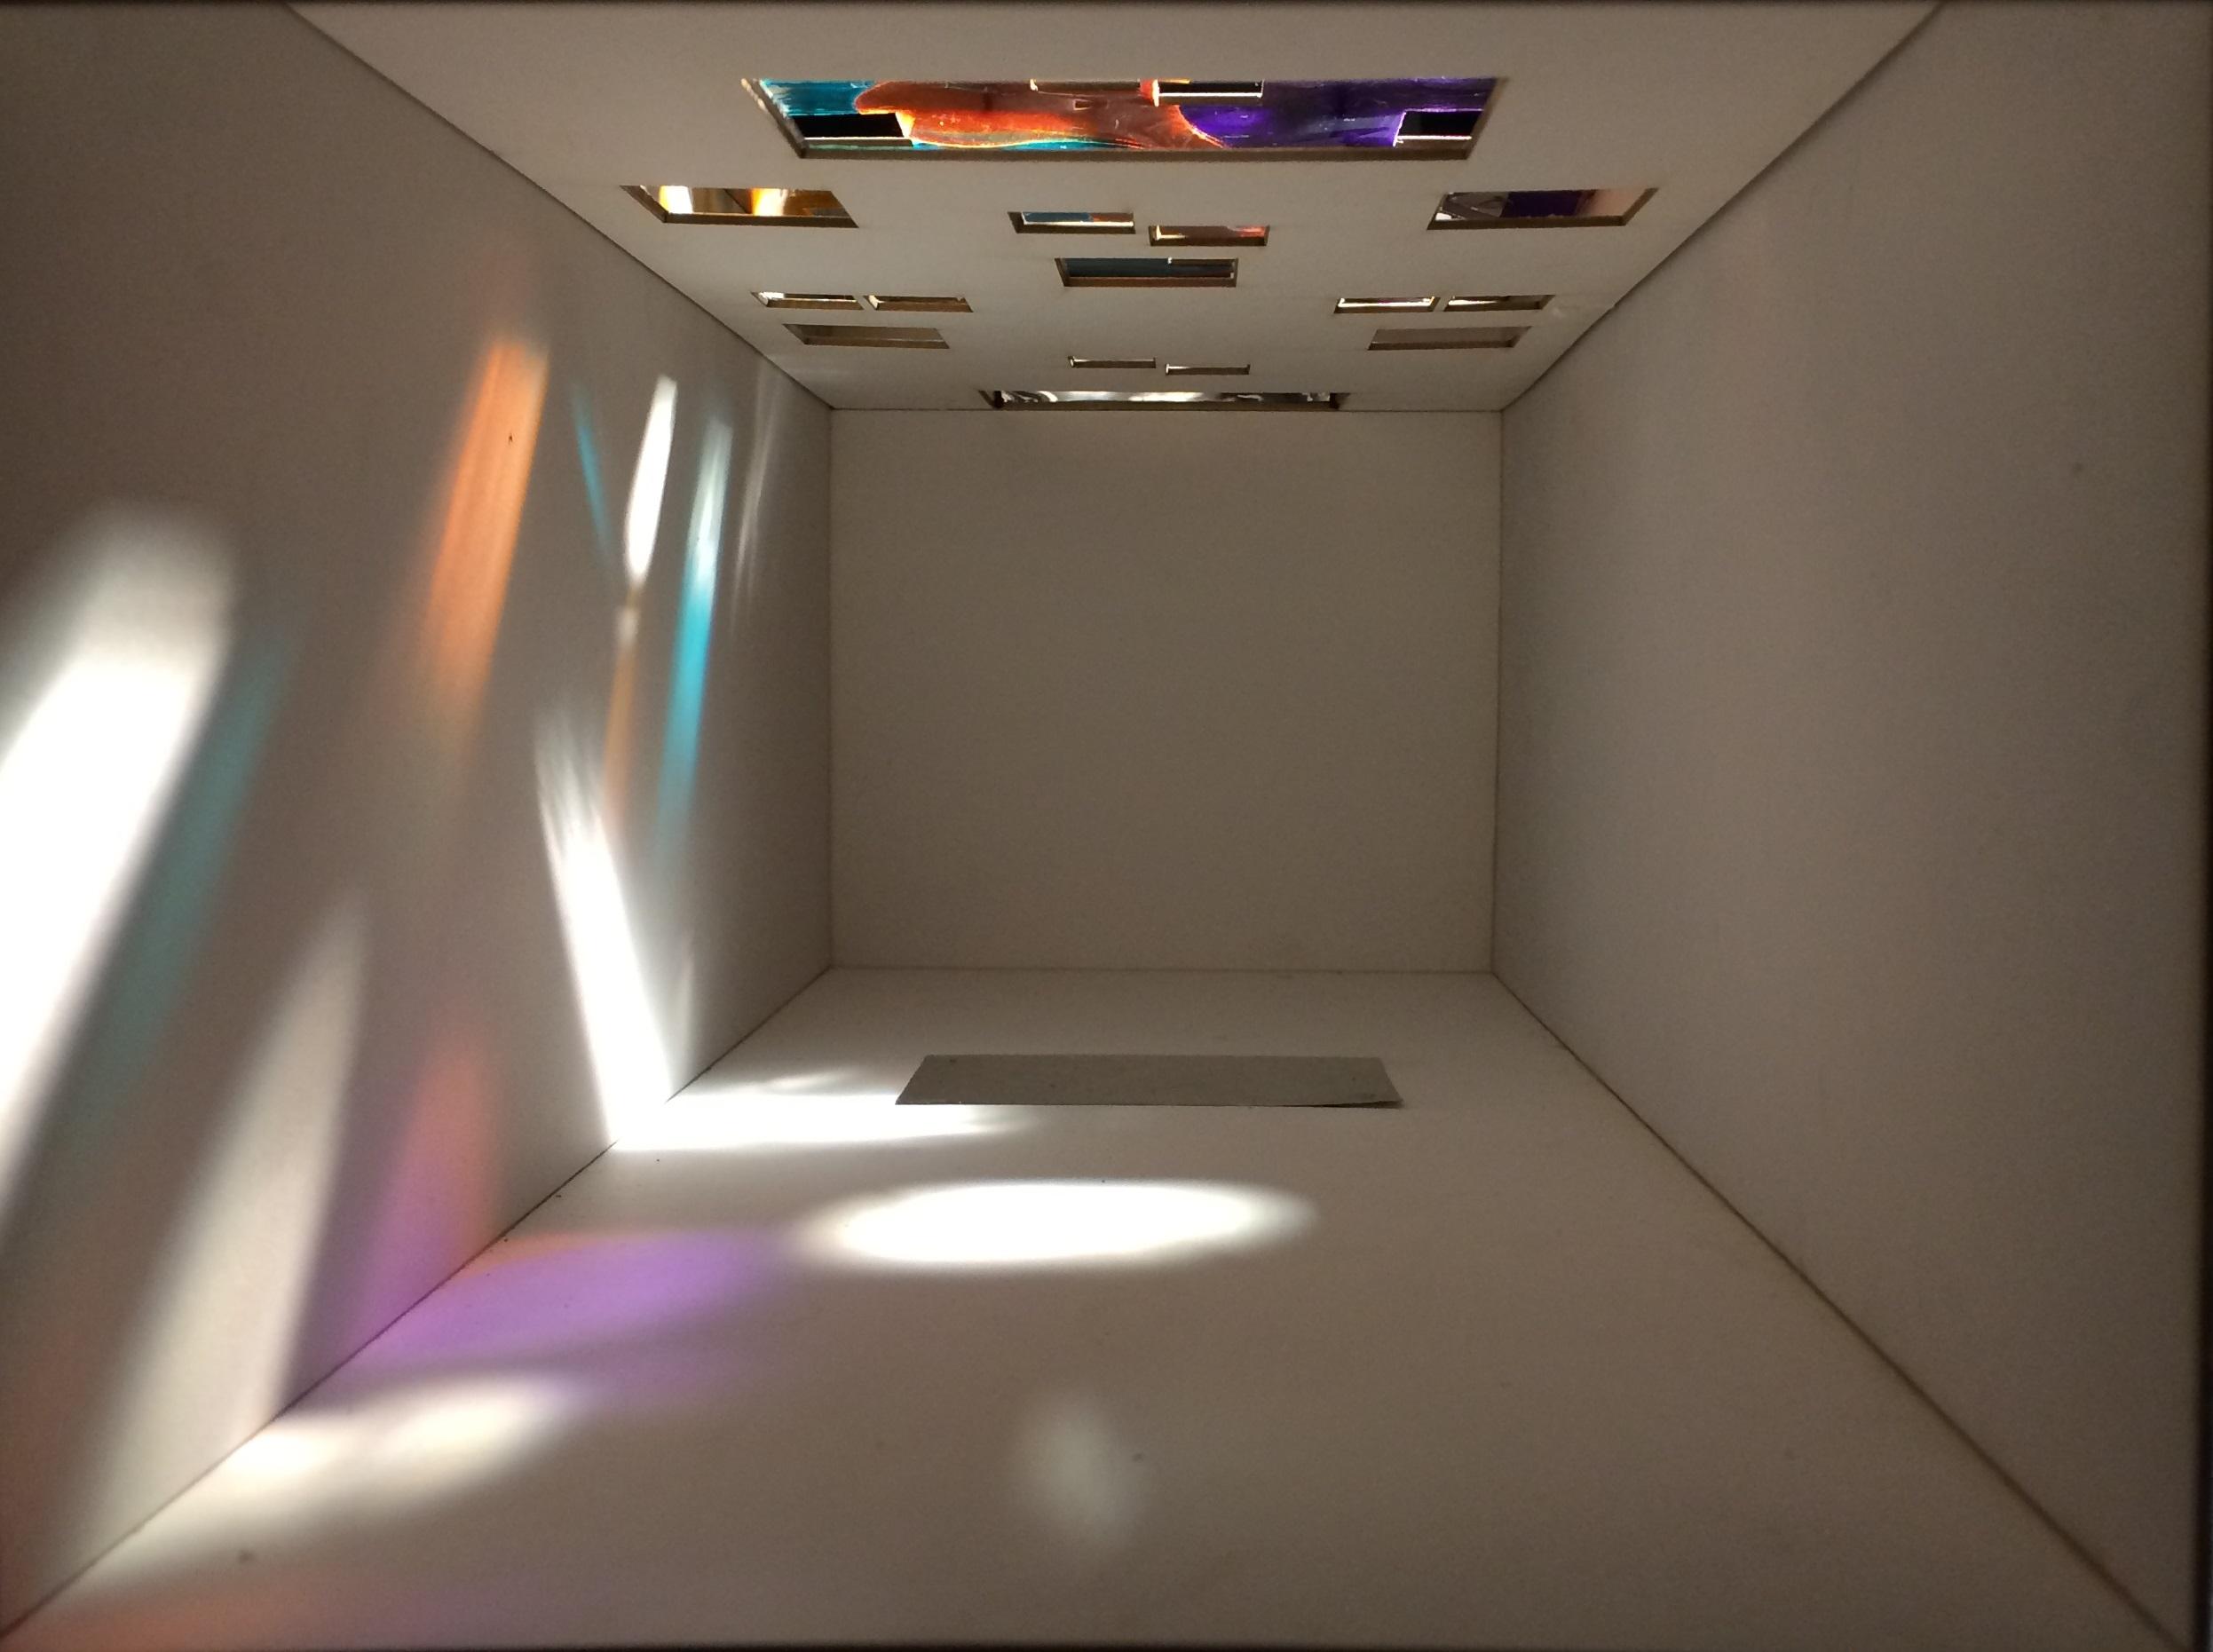 fatemeh-abadian-mps-interior-lighting-design-projects_17644112855_o.jpg